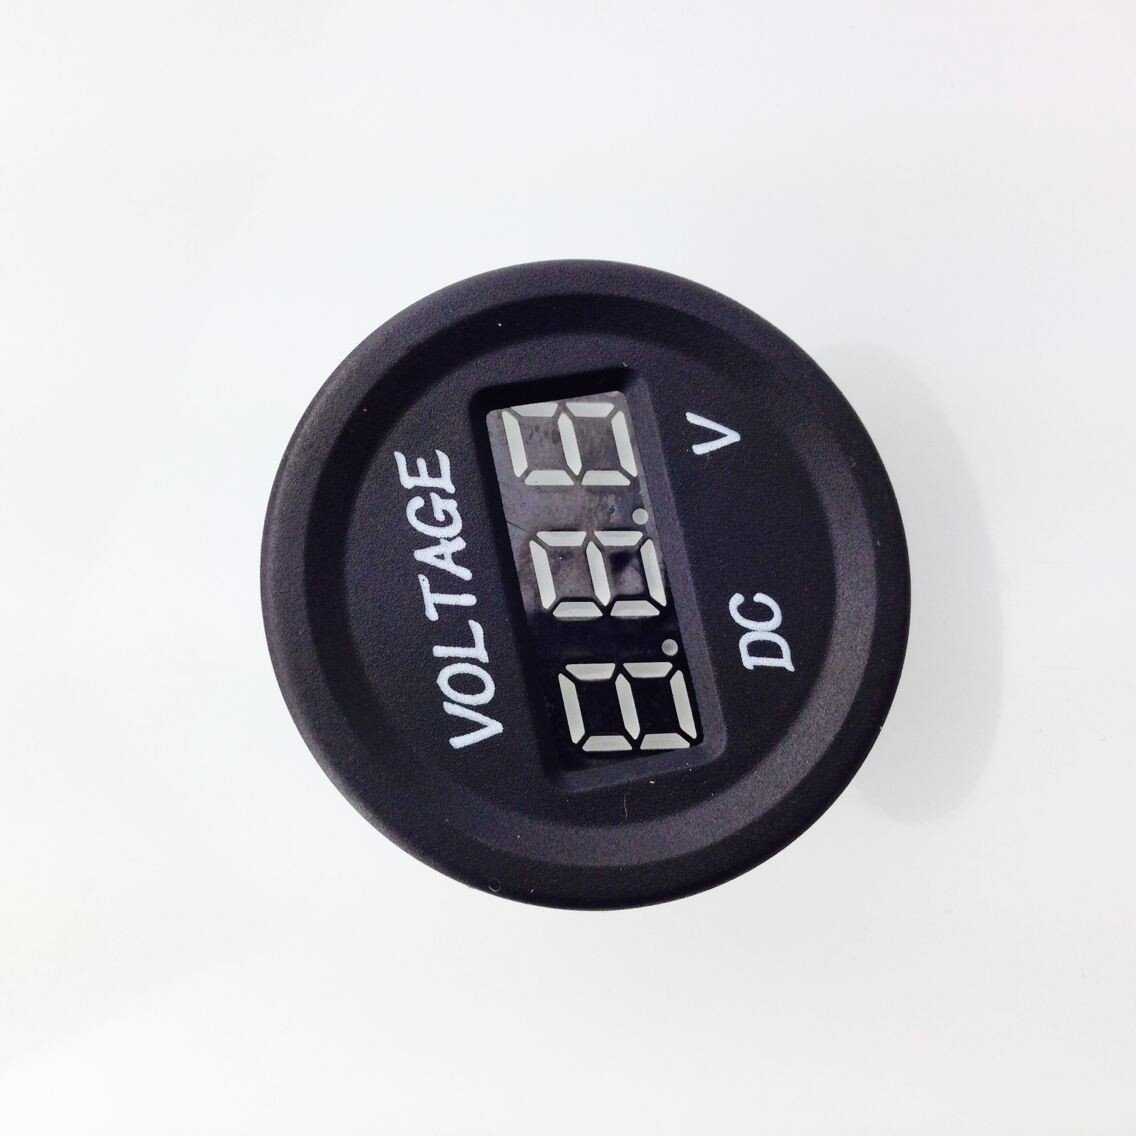 Jili Online 12V 24V Waterproof Car Motorcycle LED Digital Display Voltmeter With Cable by Jili Online (Image #1)